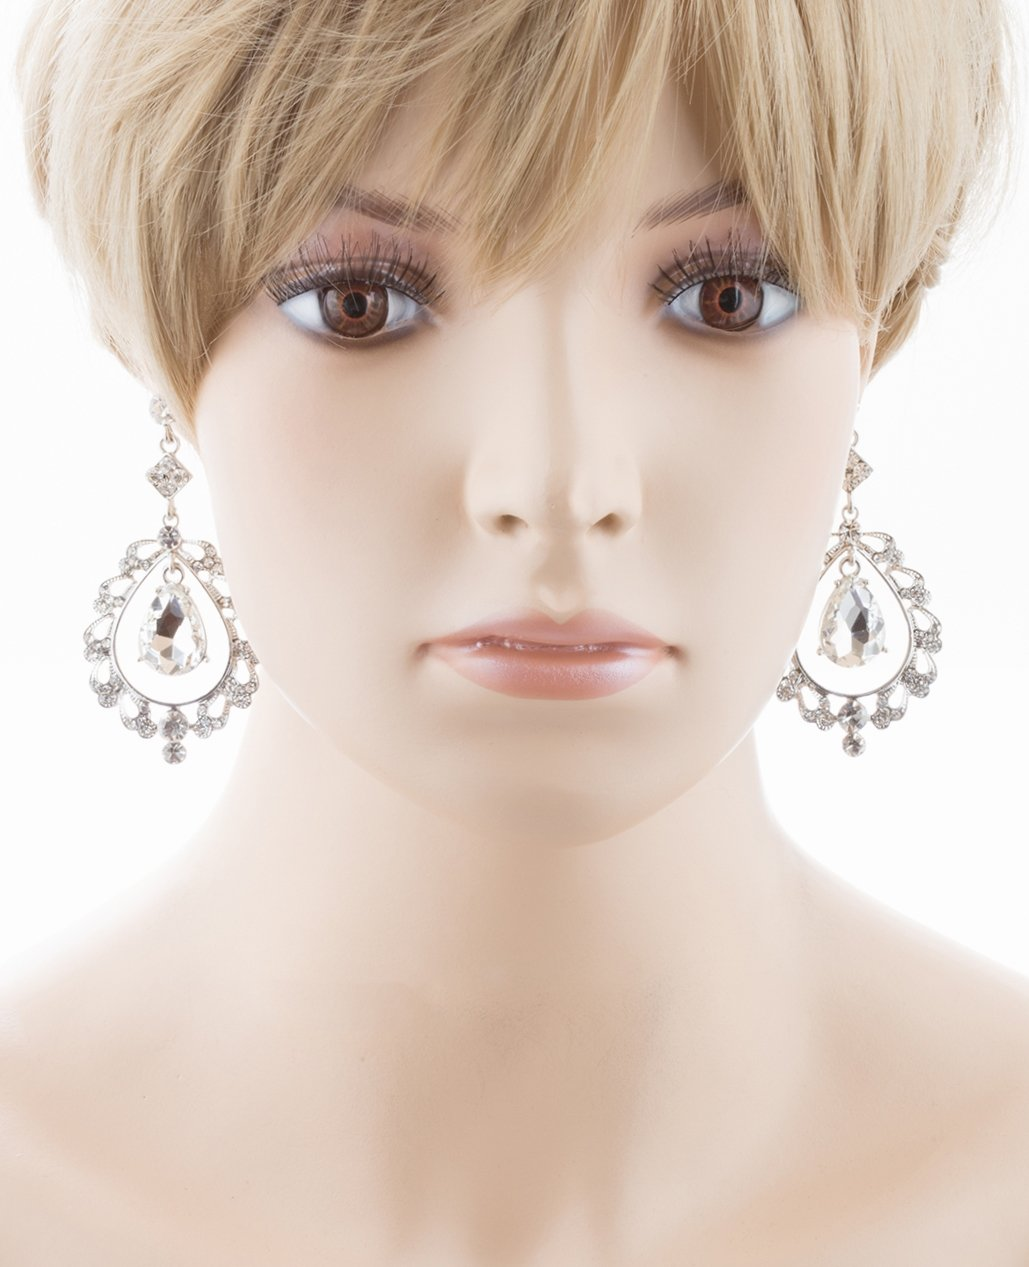 Bridal Wedding Crystal Rhinestone Teardrop Open Dangling Drop Fashion Earrings by Accessoriesforever (Image #1)